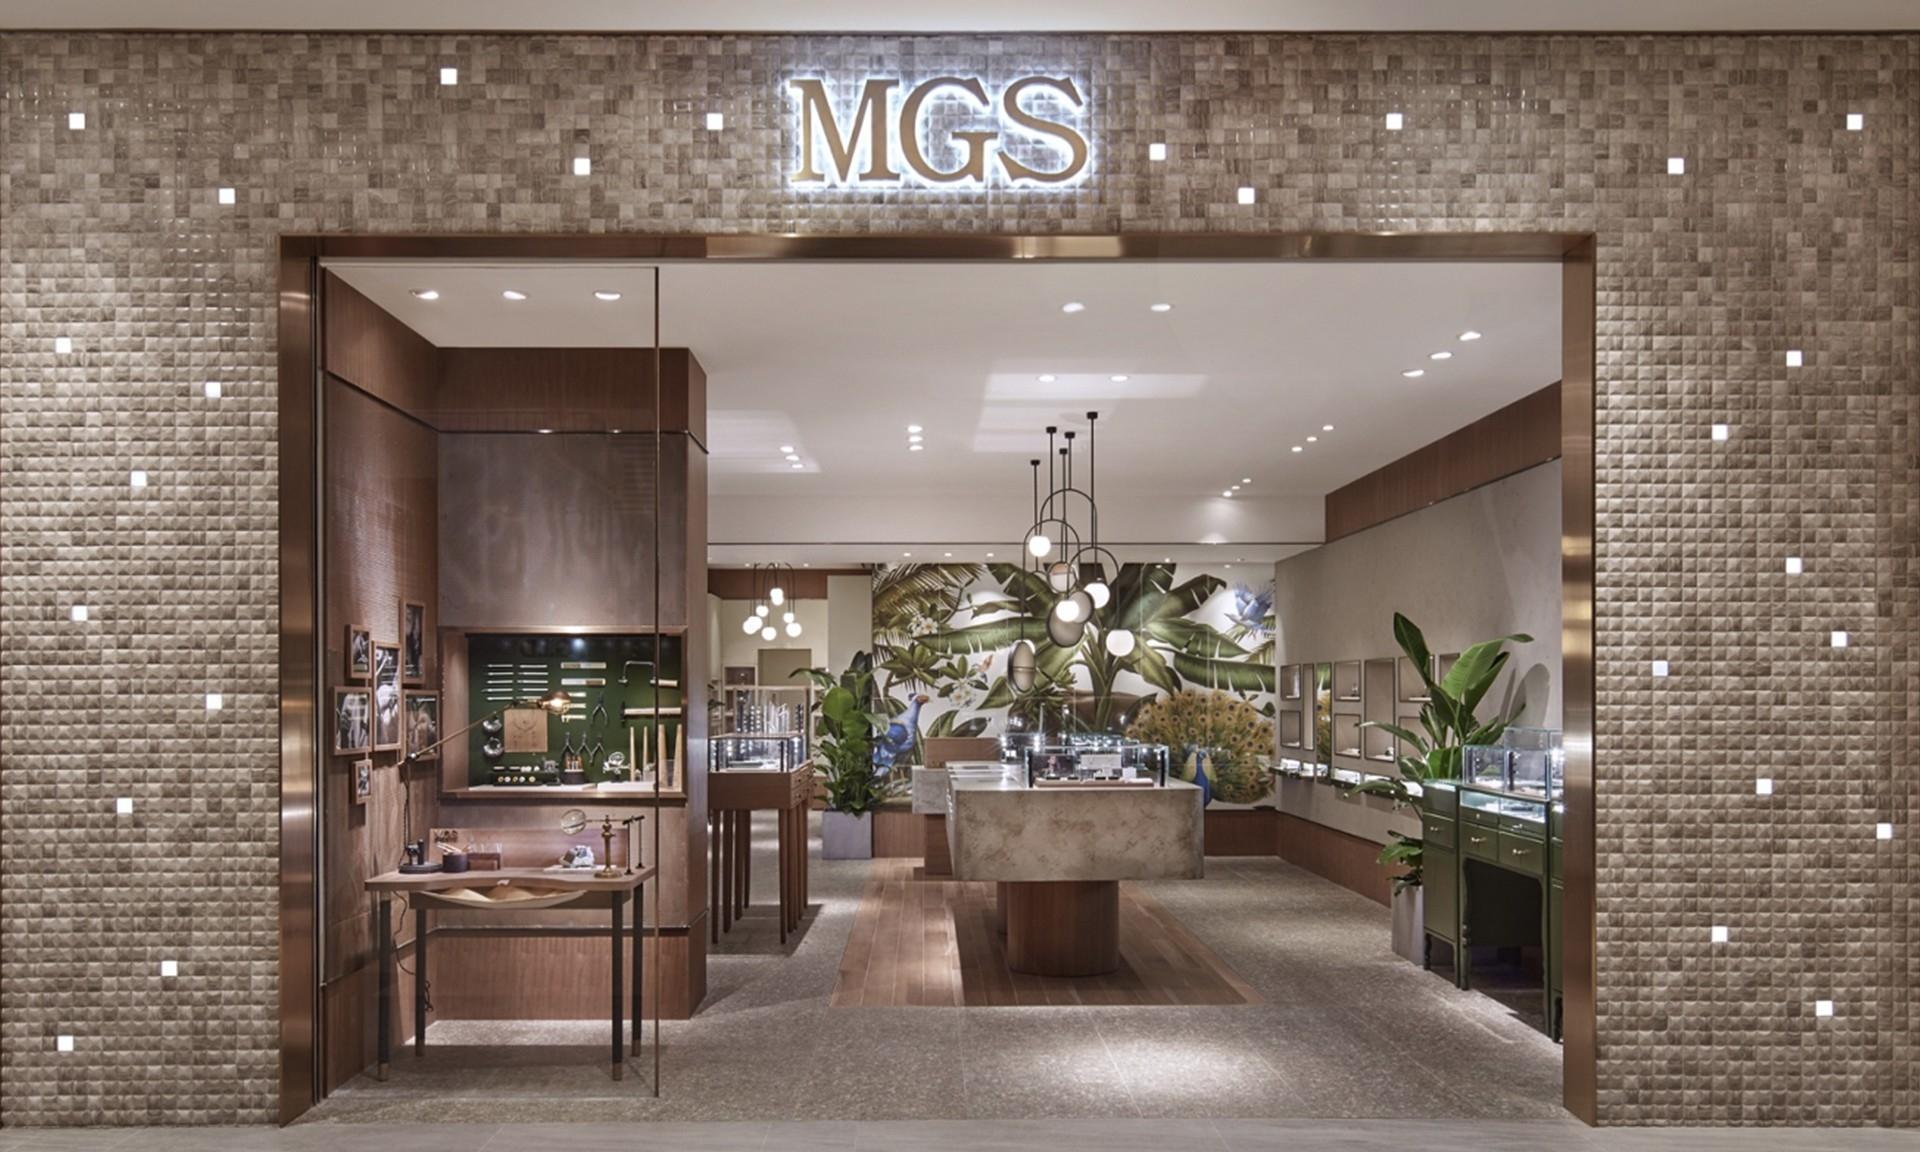 mgs-01